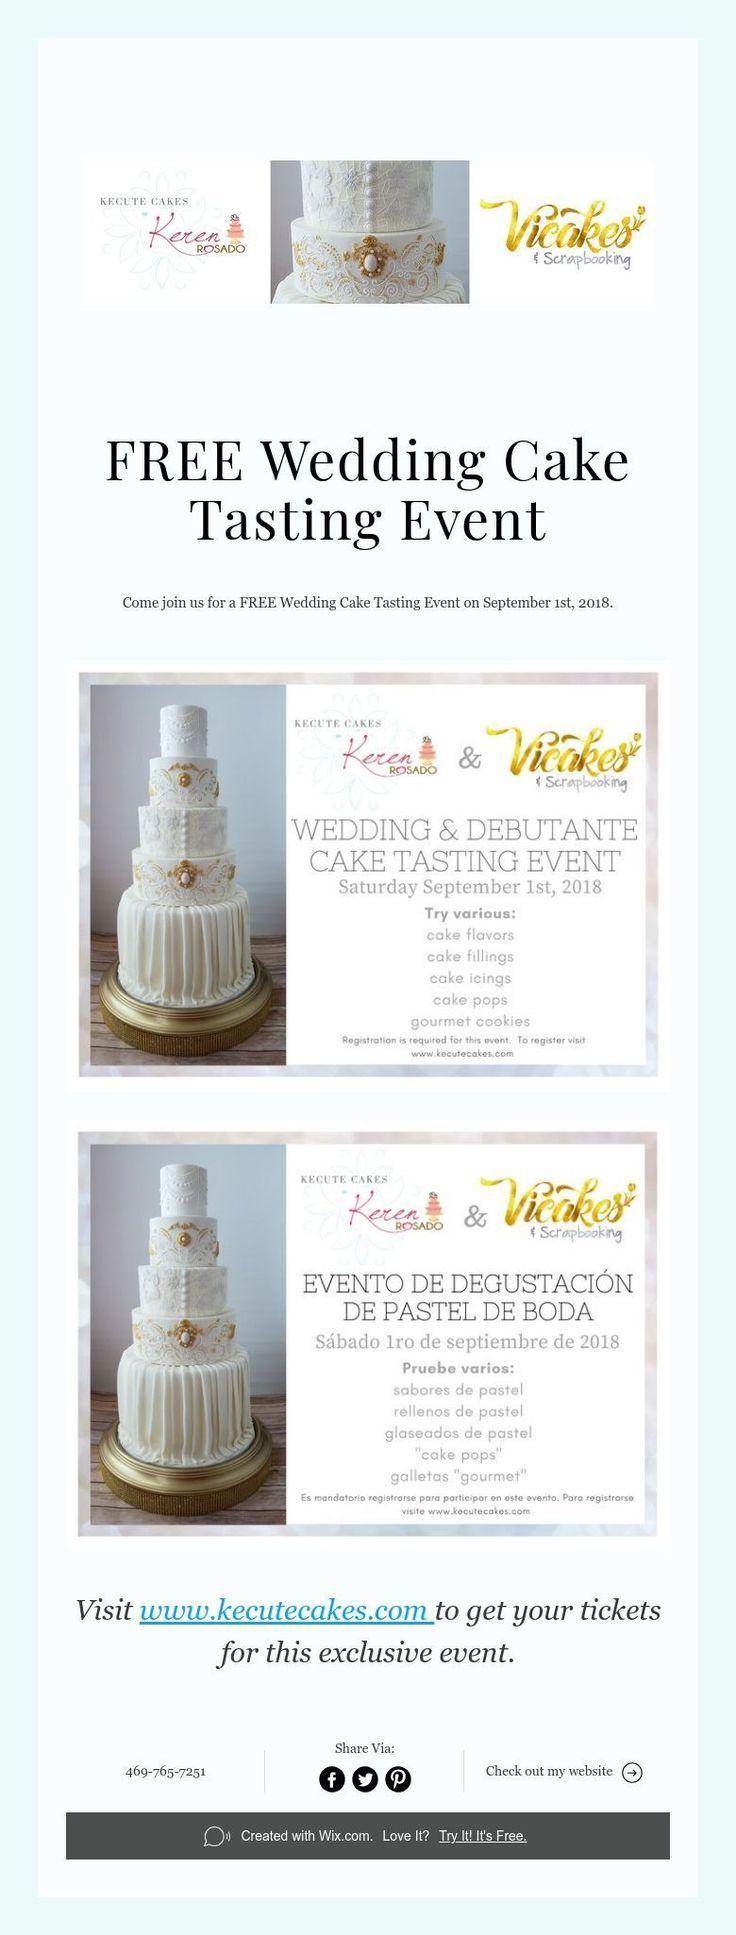 Free Wedding Cake Tasting Event Wedding Cake Tasting Cake Tasting Free Wedding